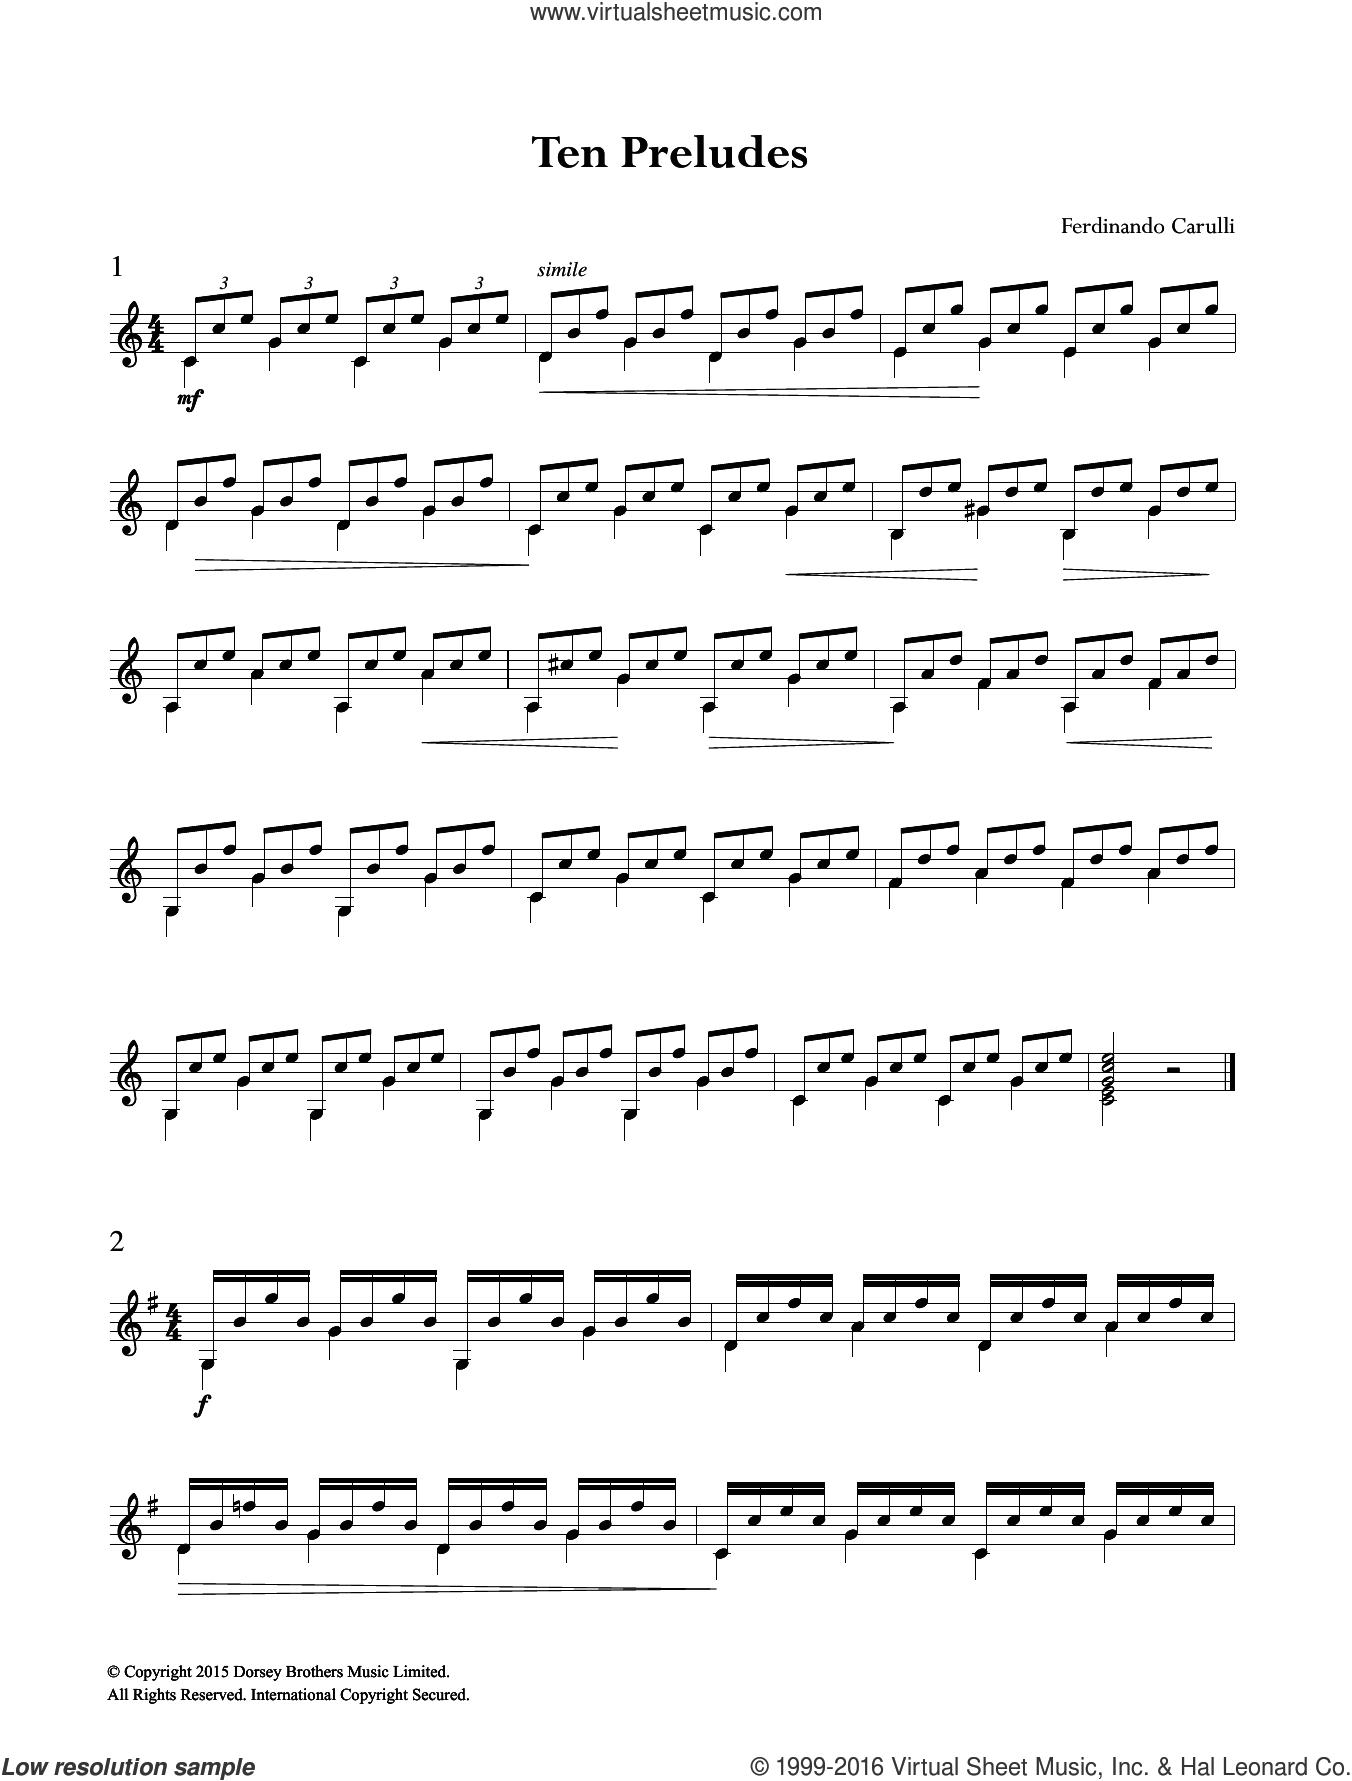 Ten Preludes sheet music for guitar solo (chords) by Ferdinando Carulli, classical score, easy guitar (chords)